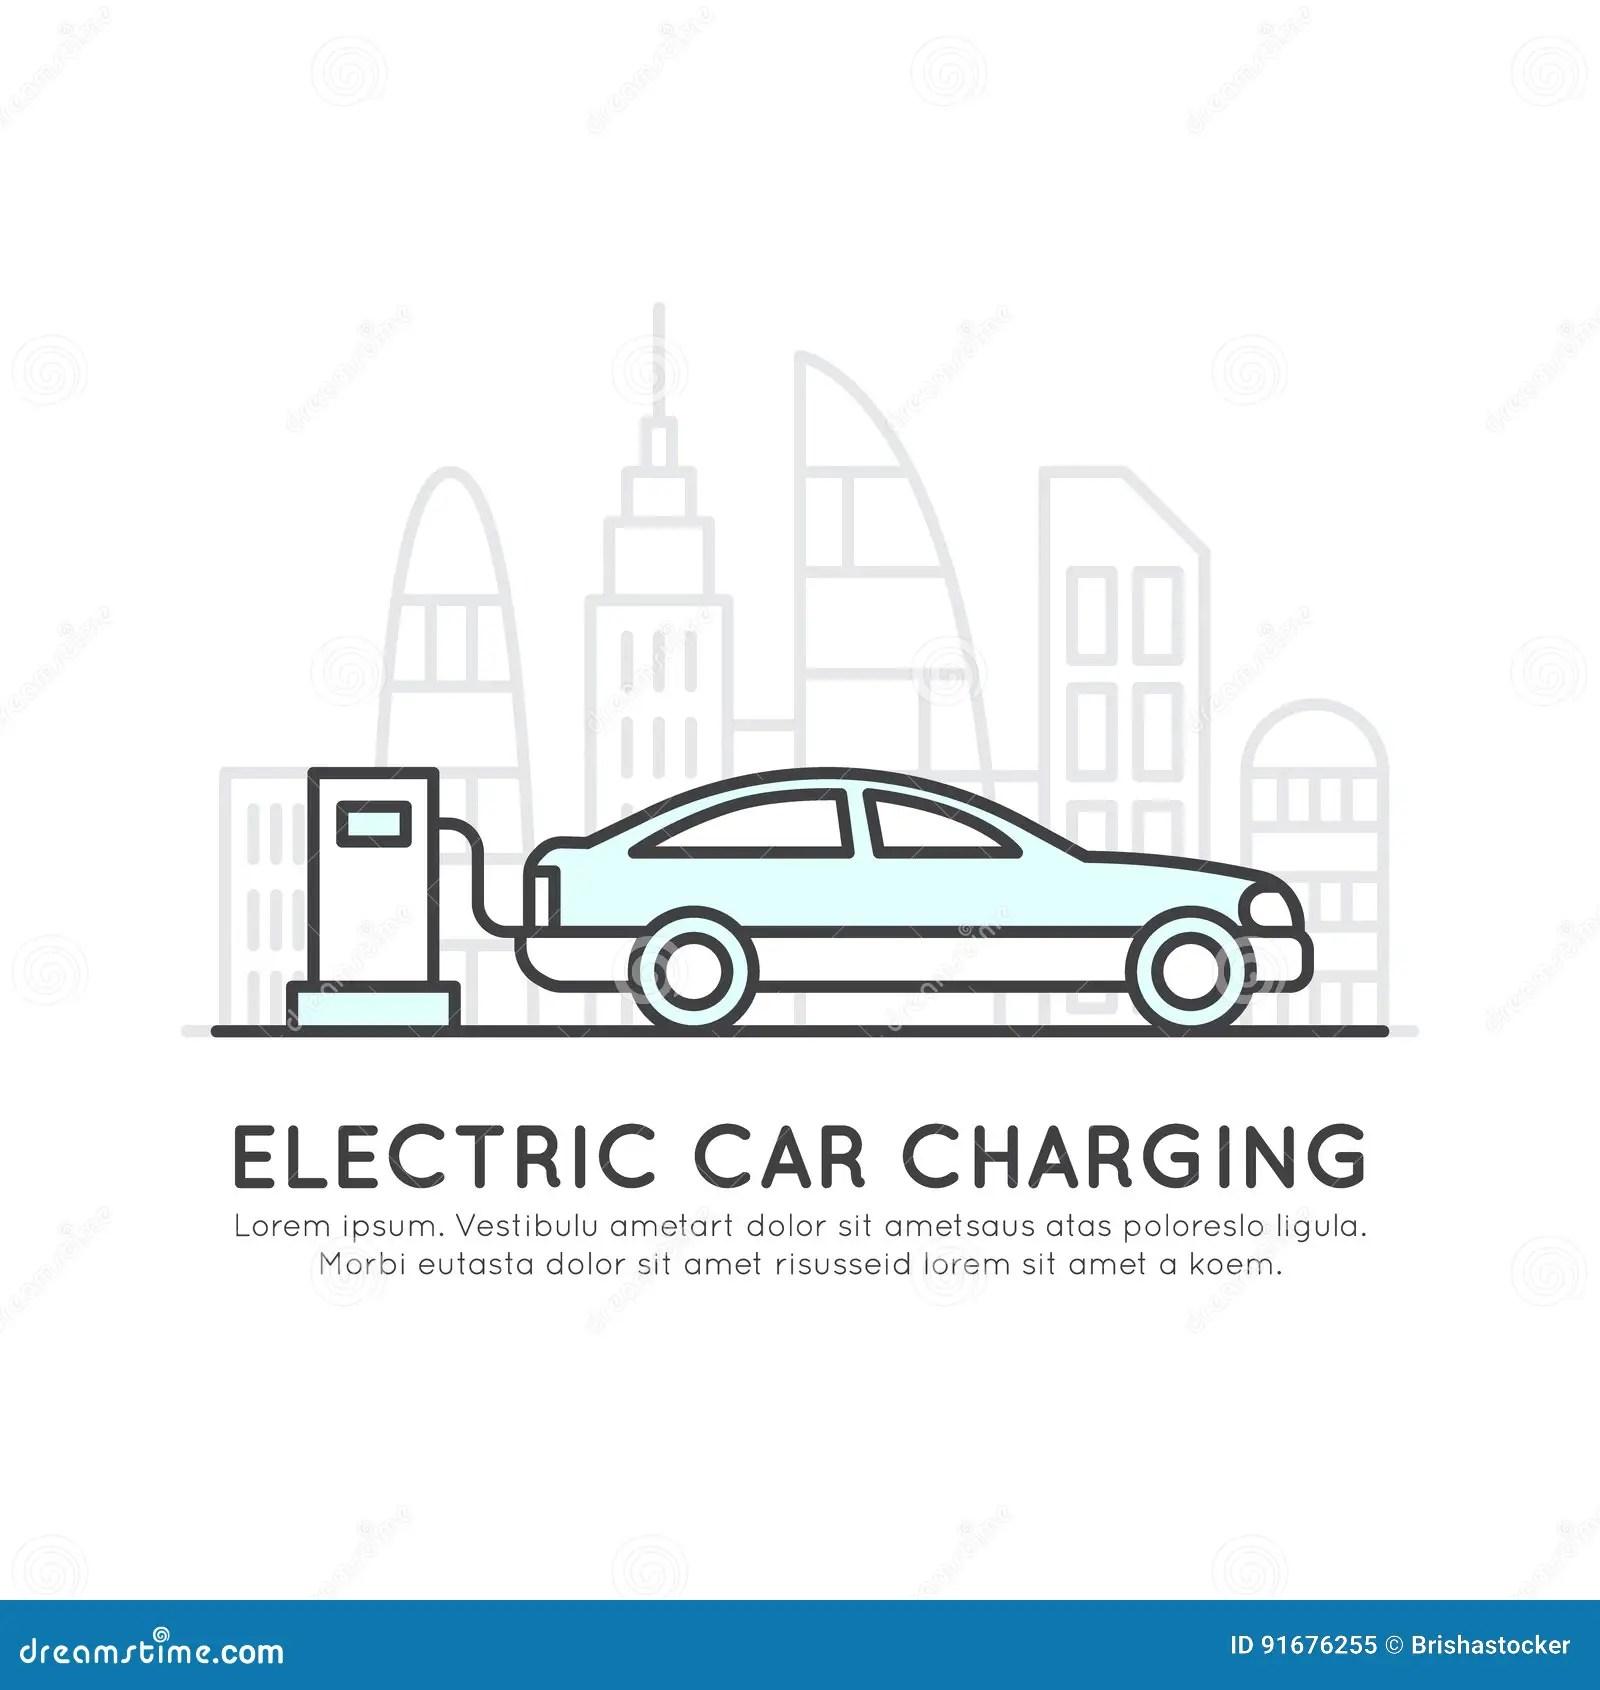 Solar Vehicle Wiring Diagram Electrical Diagrams Car Of Energy Schematics Generator Fuse